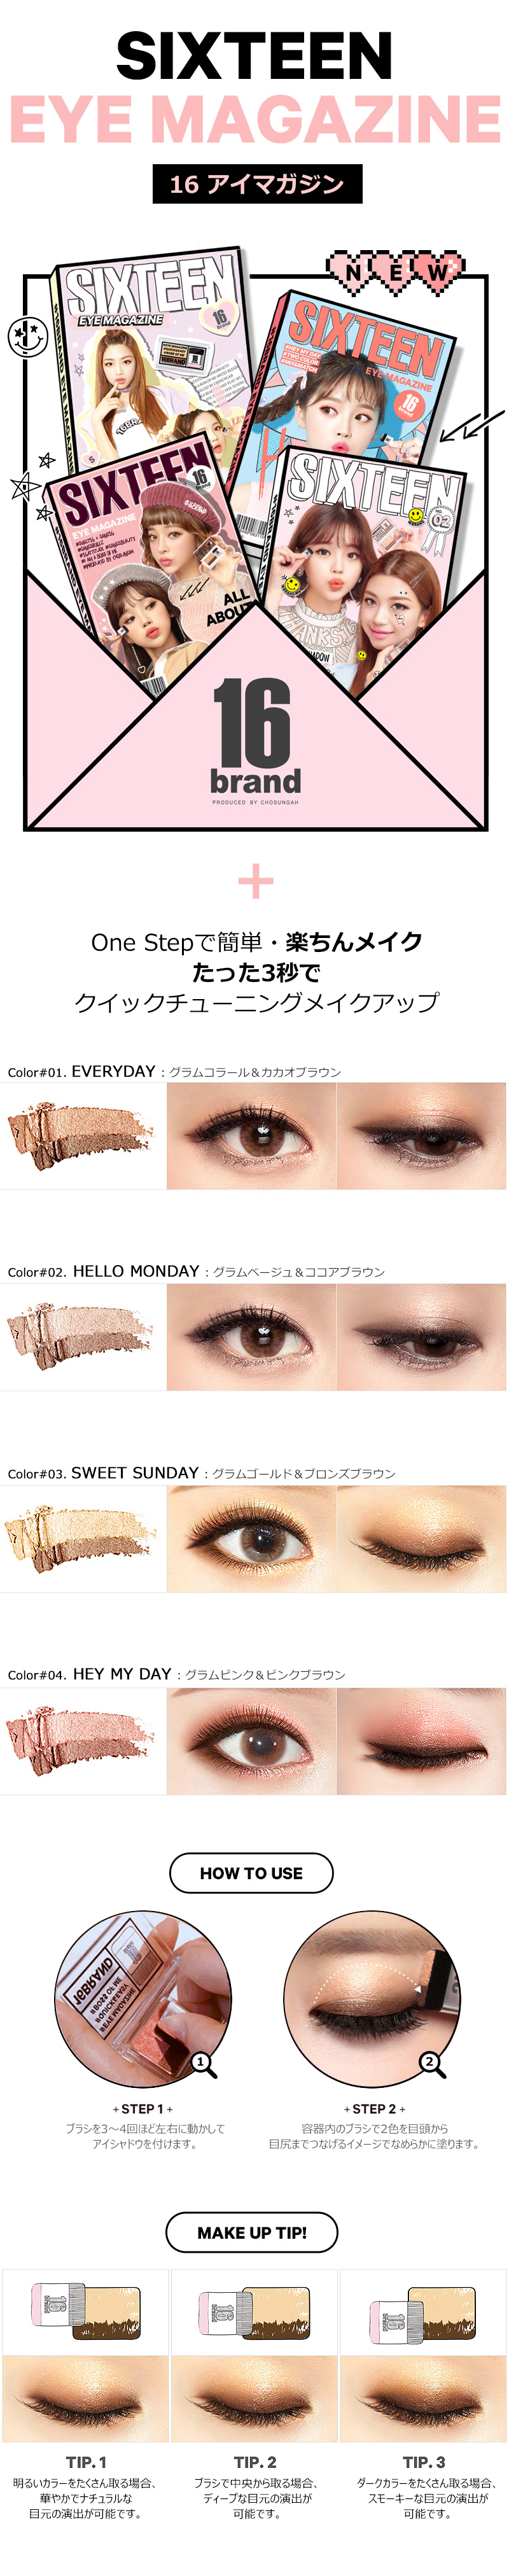 16brand 16 1 Sixteen Eye Magazine Shadow Brand 4